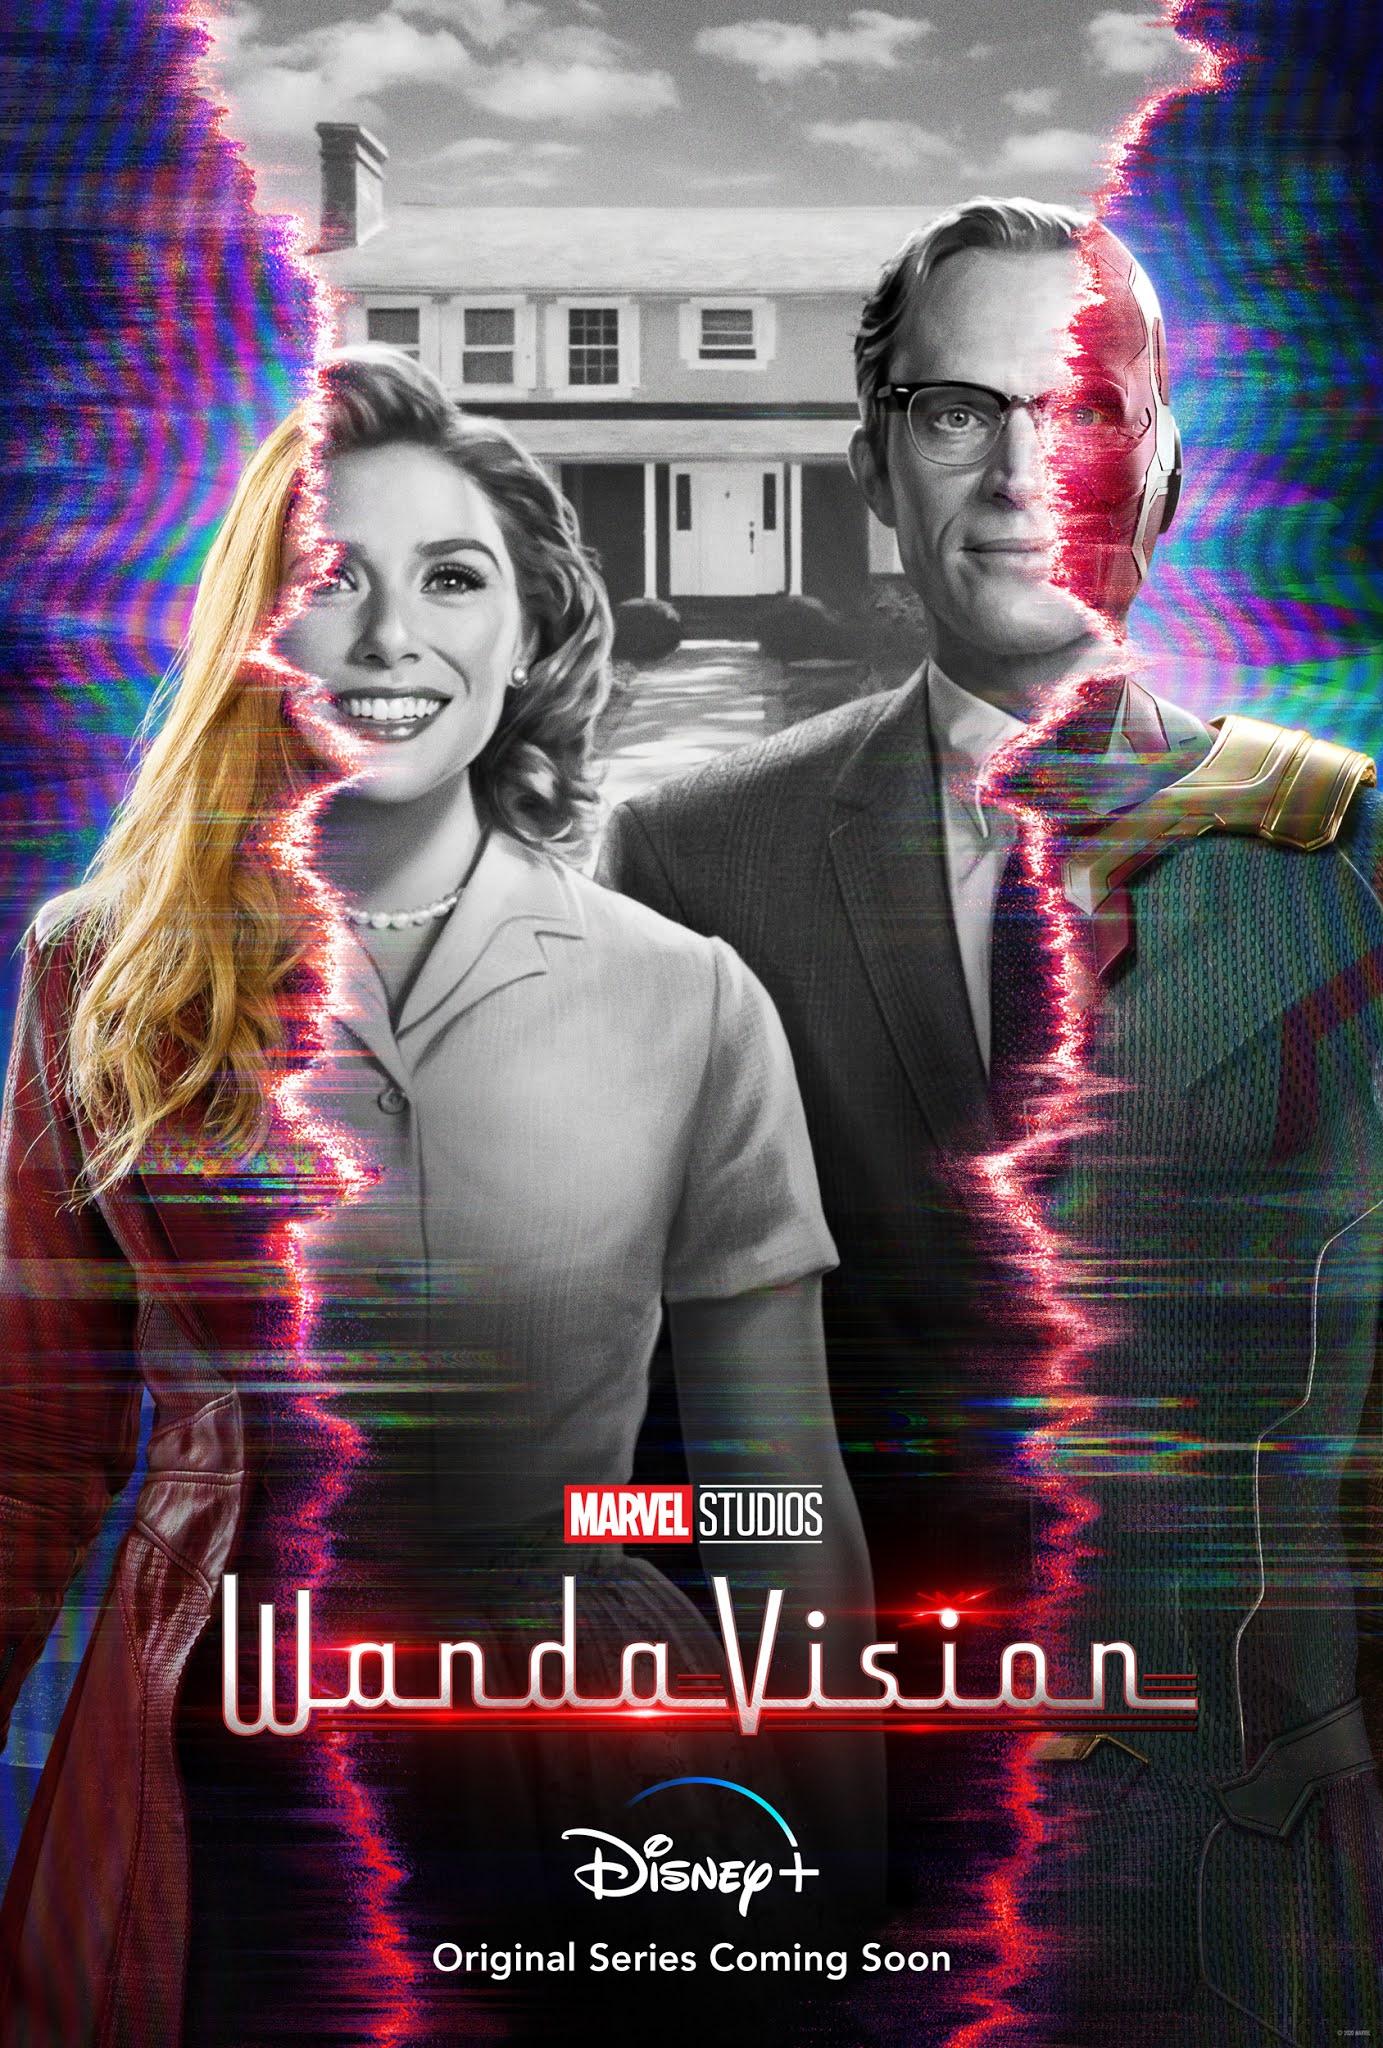 wanda vision olsen bethany disney+ marvel cinematic universe